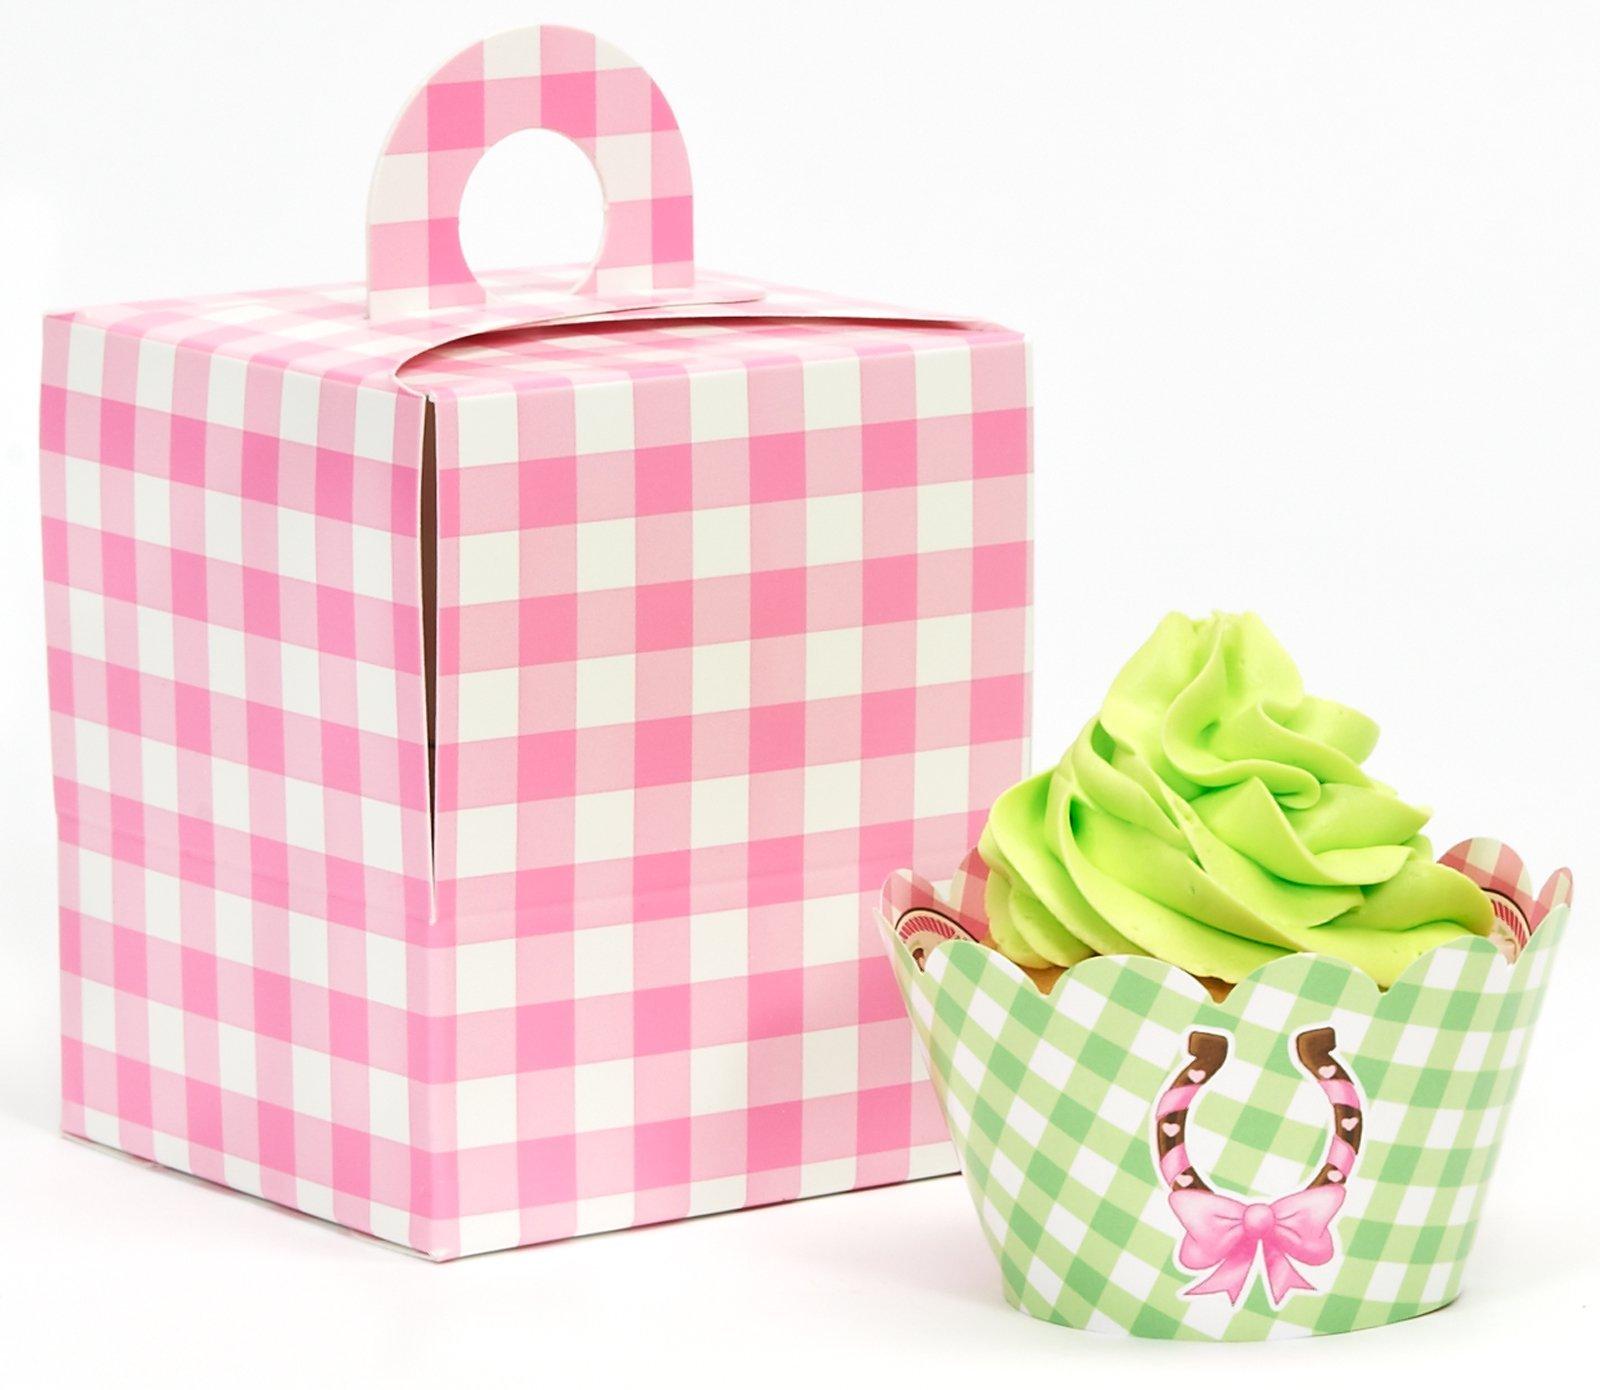 BirthdayExpress Pink Cowgirl Party Supplies - Cupcake Wrapper & Box Kit